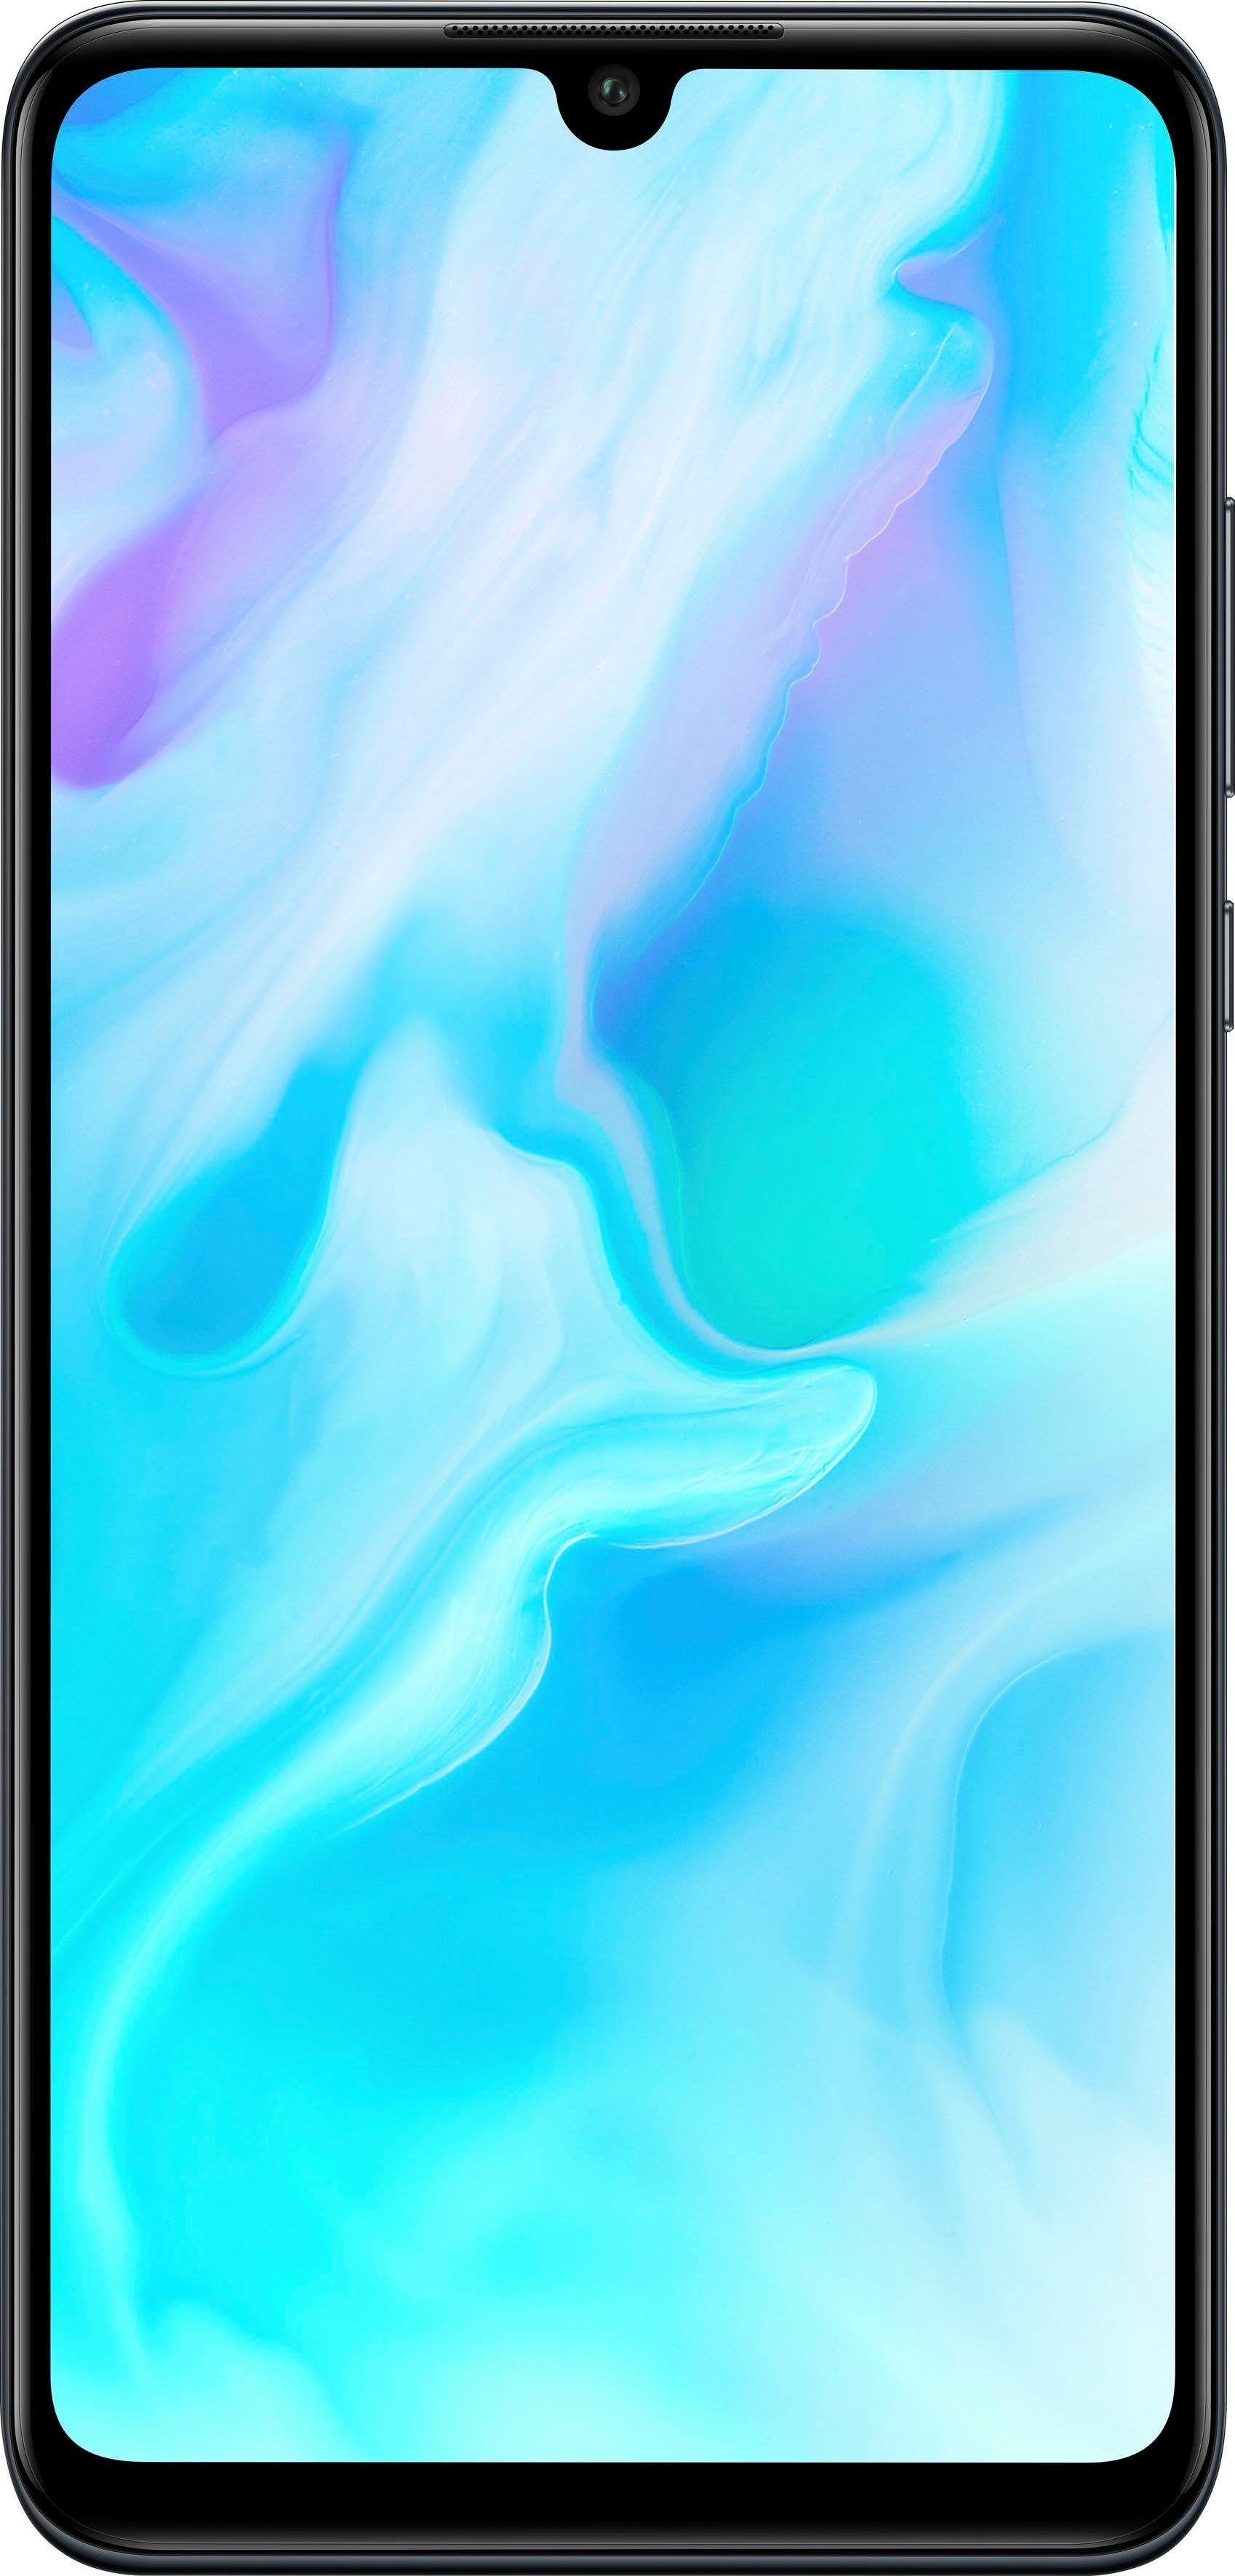 Huawei P30 lite Smartphone (15,62 cm/6,1 Zoll, 128 GB Speicherplatz, 48 MP Kamera), midnight black